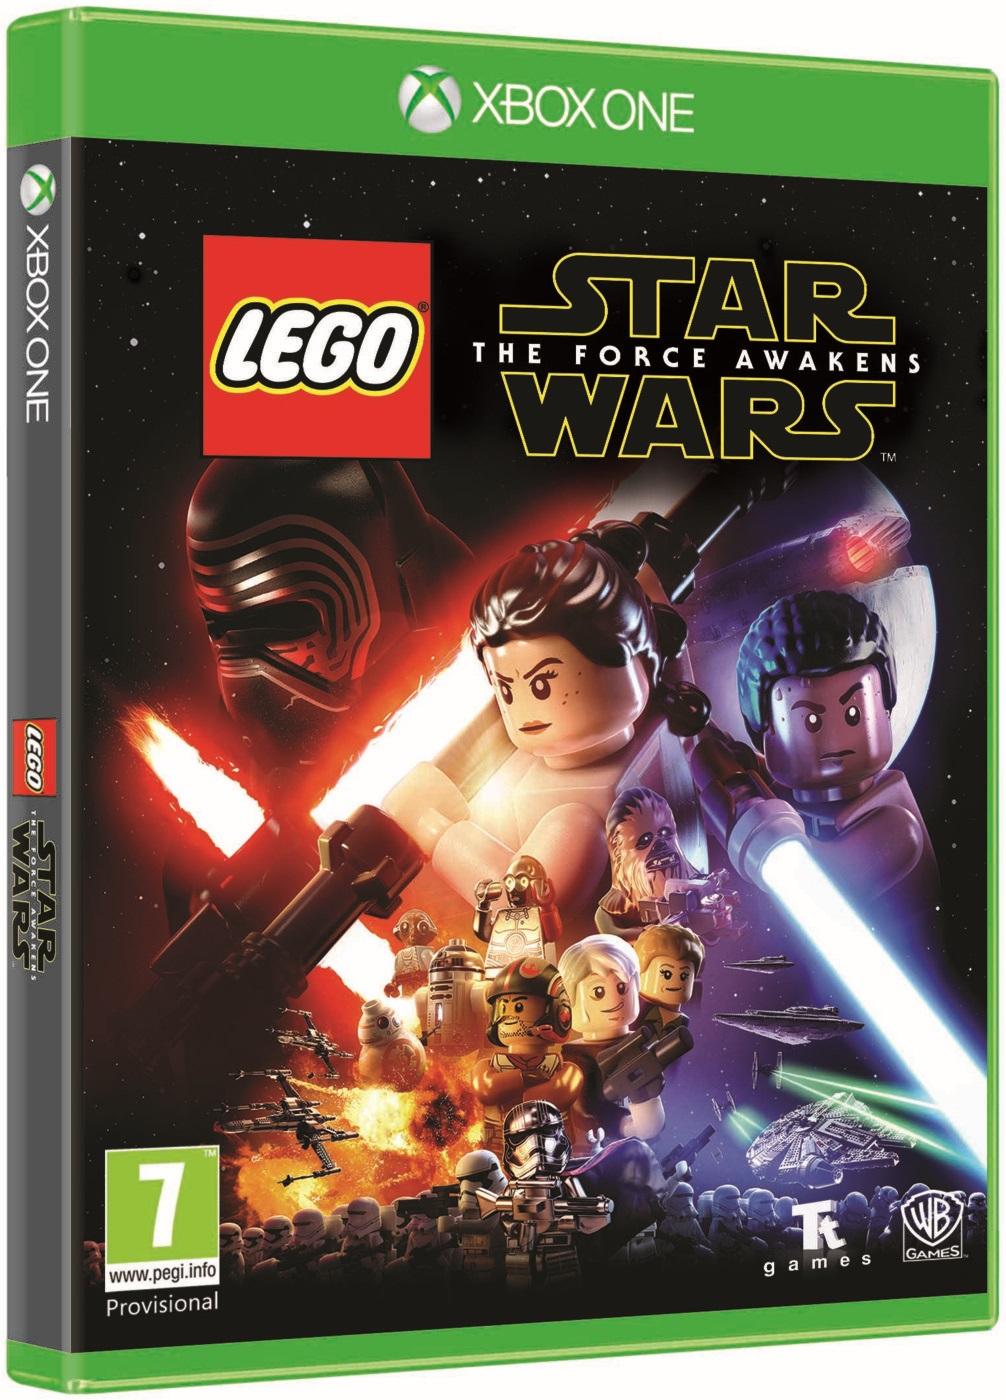 LEGO STAR WARS: THE FORCE AWAKENS - Xone